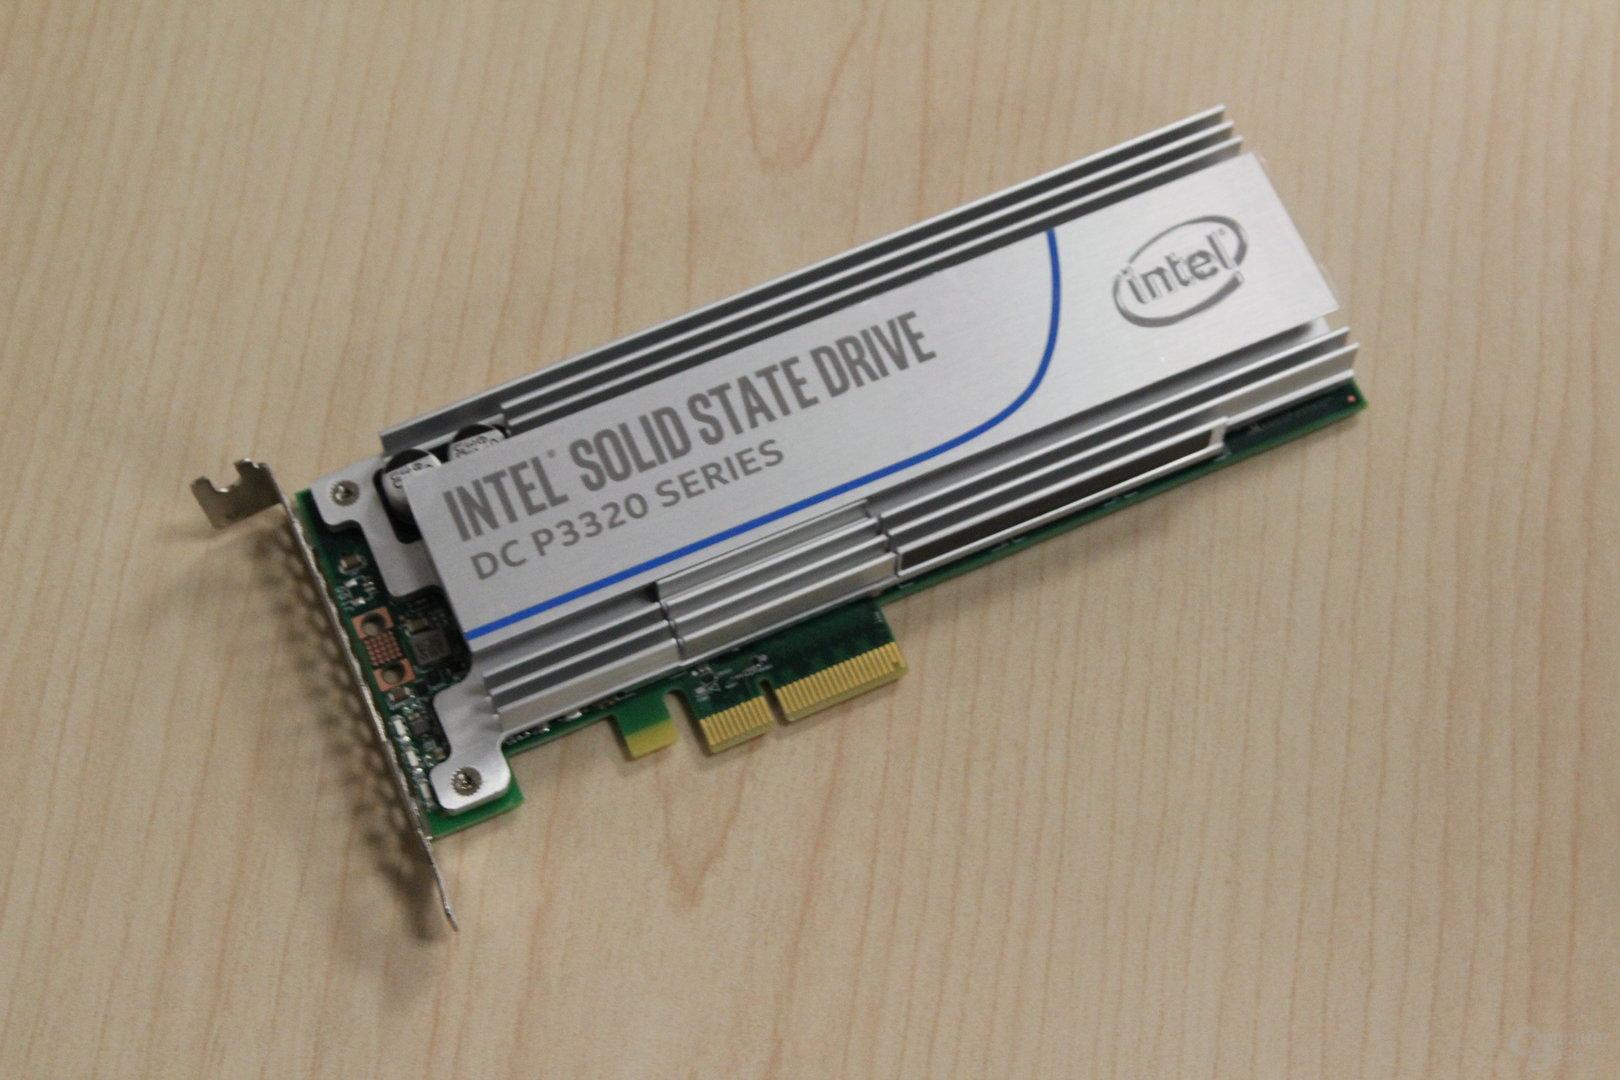 Intel SSD DC P3320 als PCIe-Karte